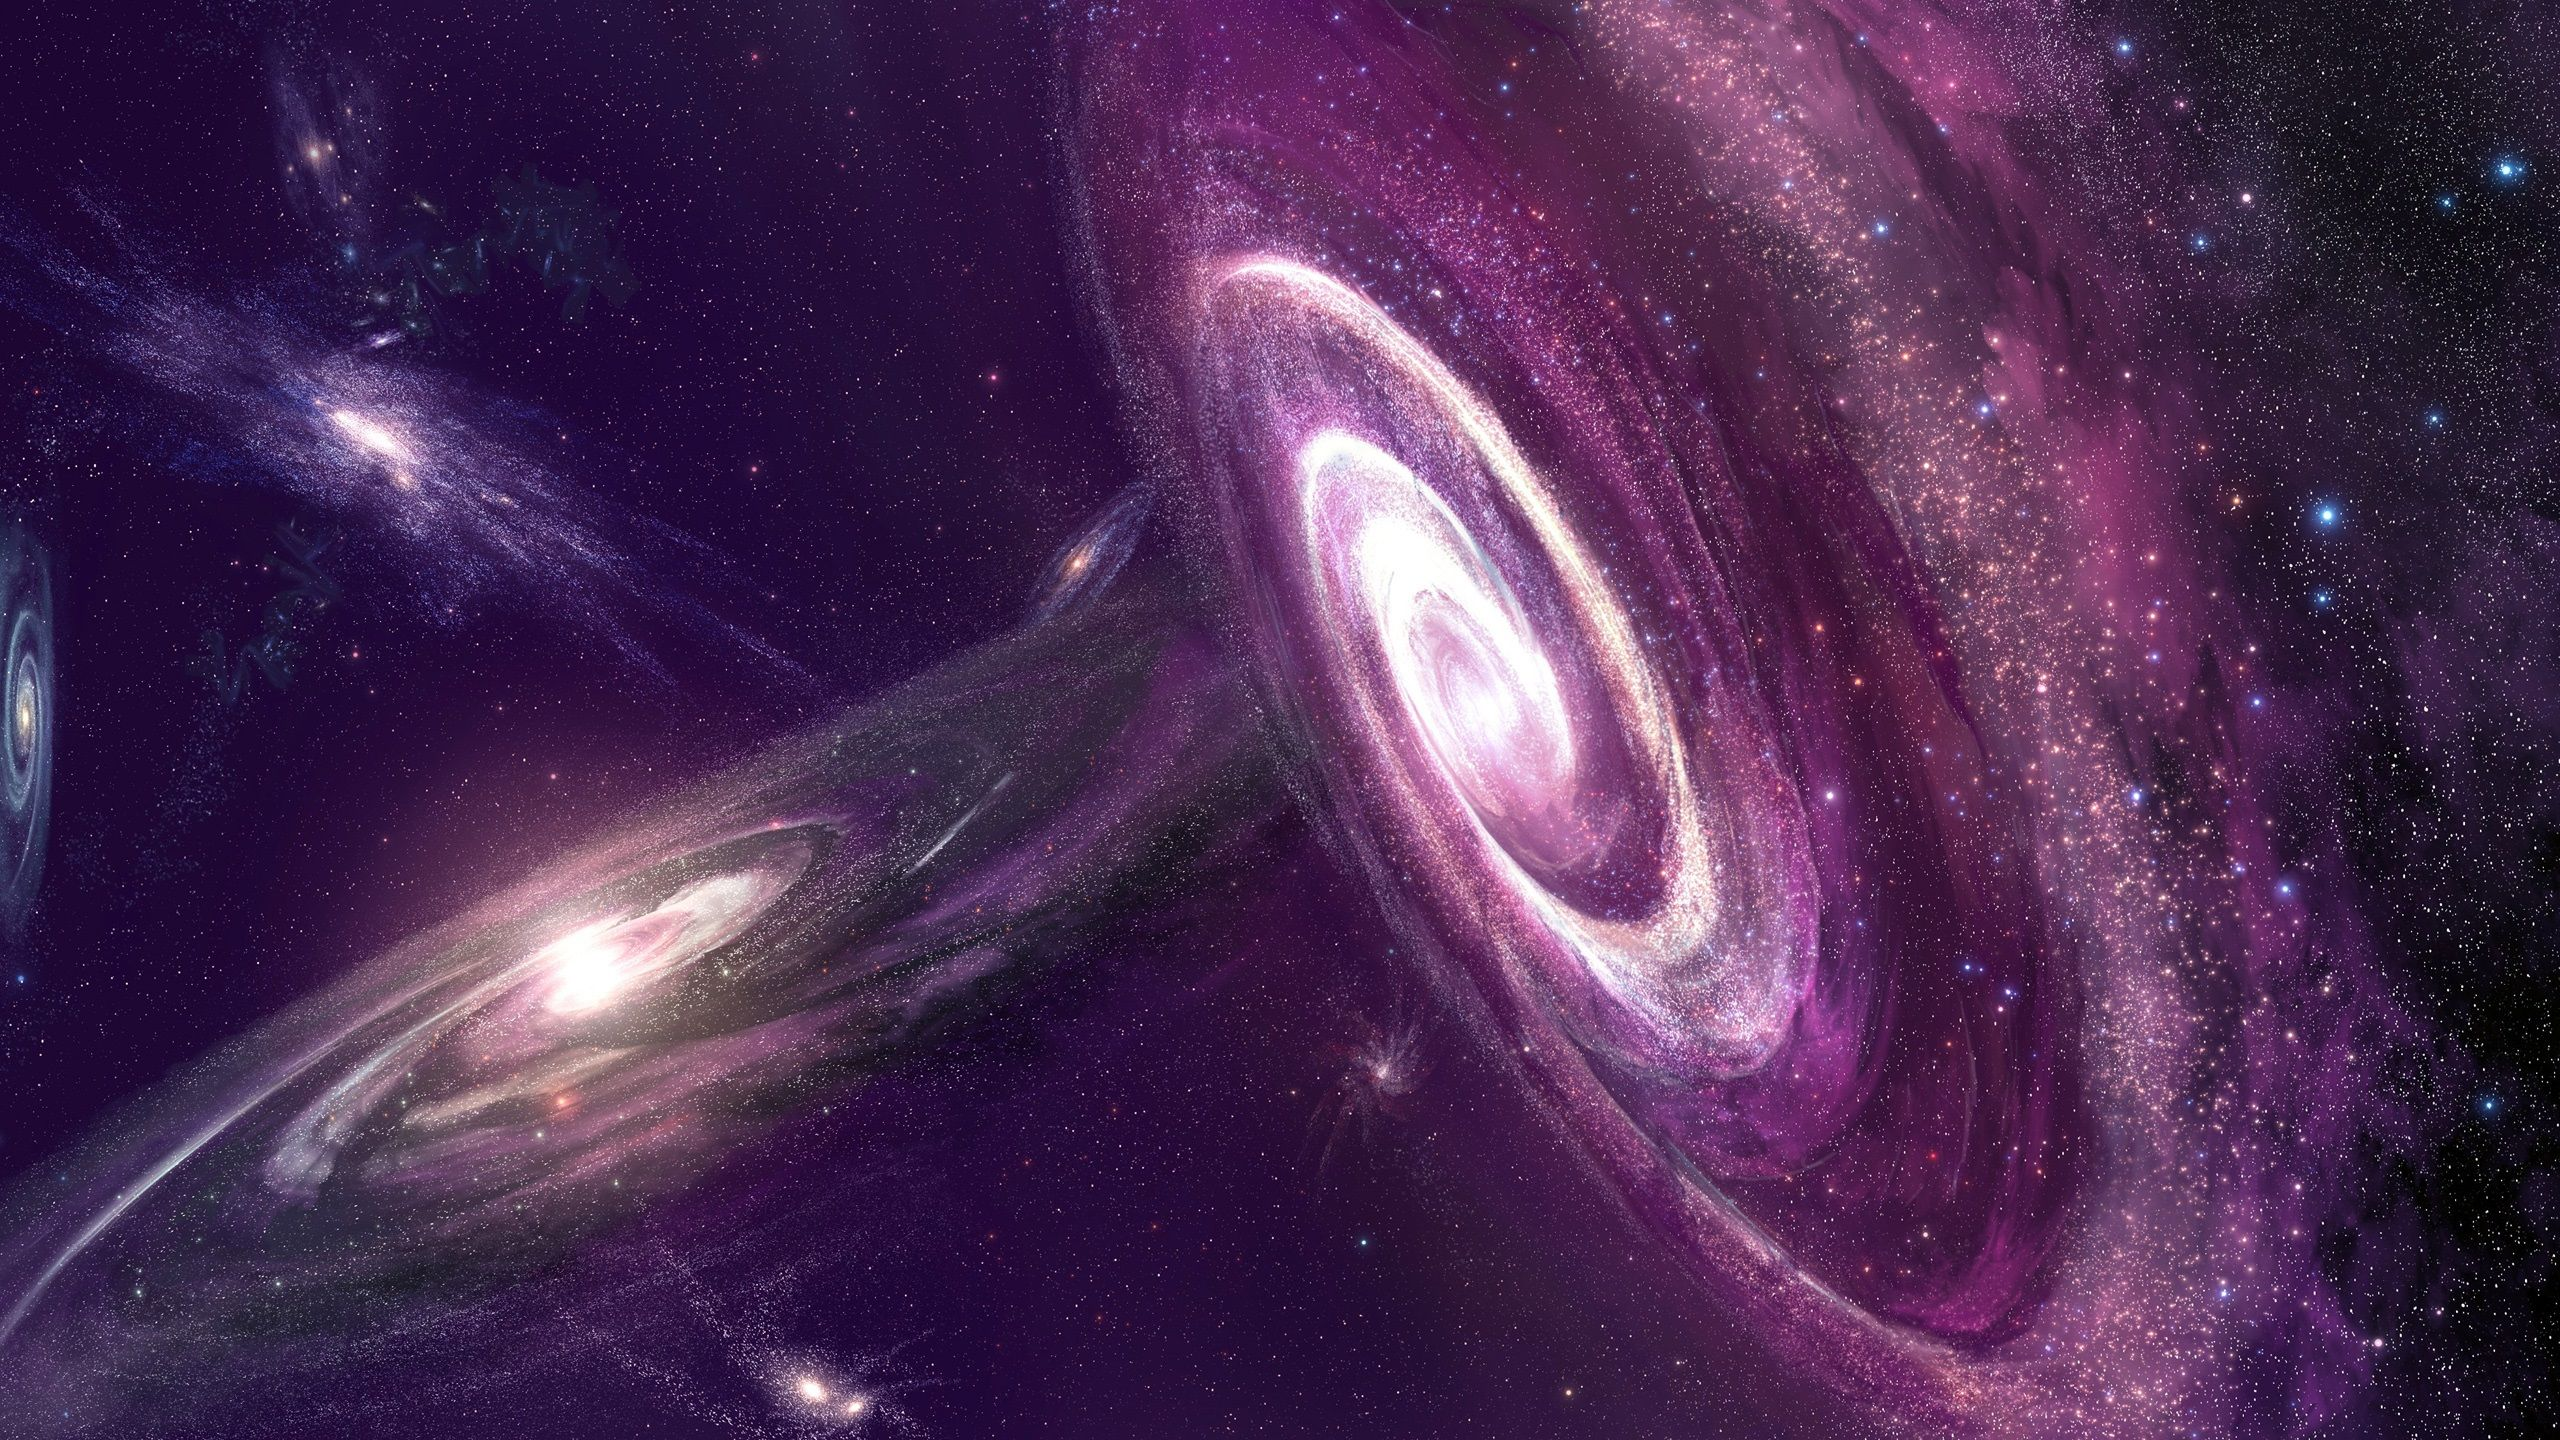 スペース 宇宙 星 銀河 星雲 紫 壁紙 2560x1440 Qhd Espace Et